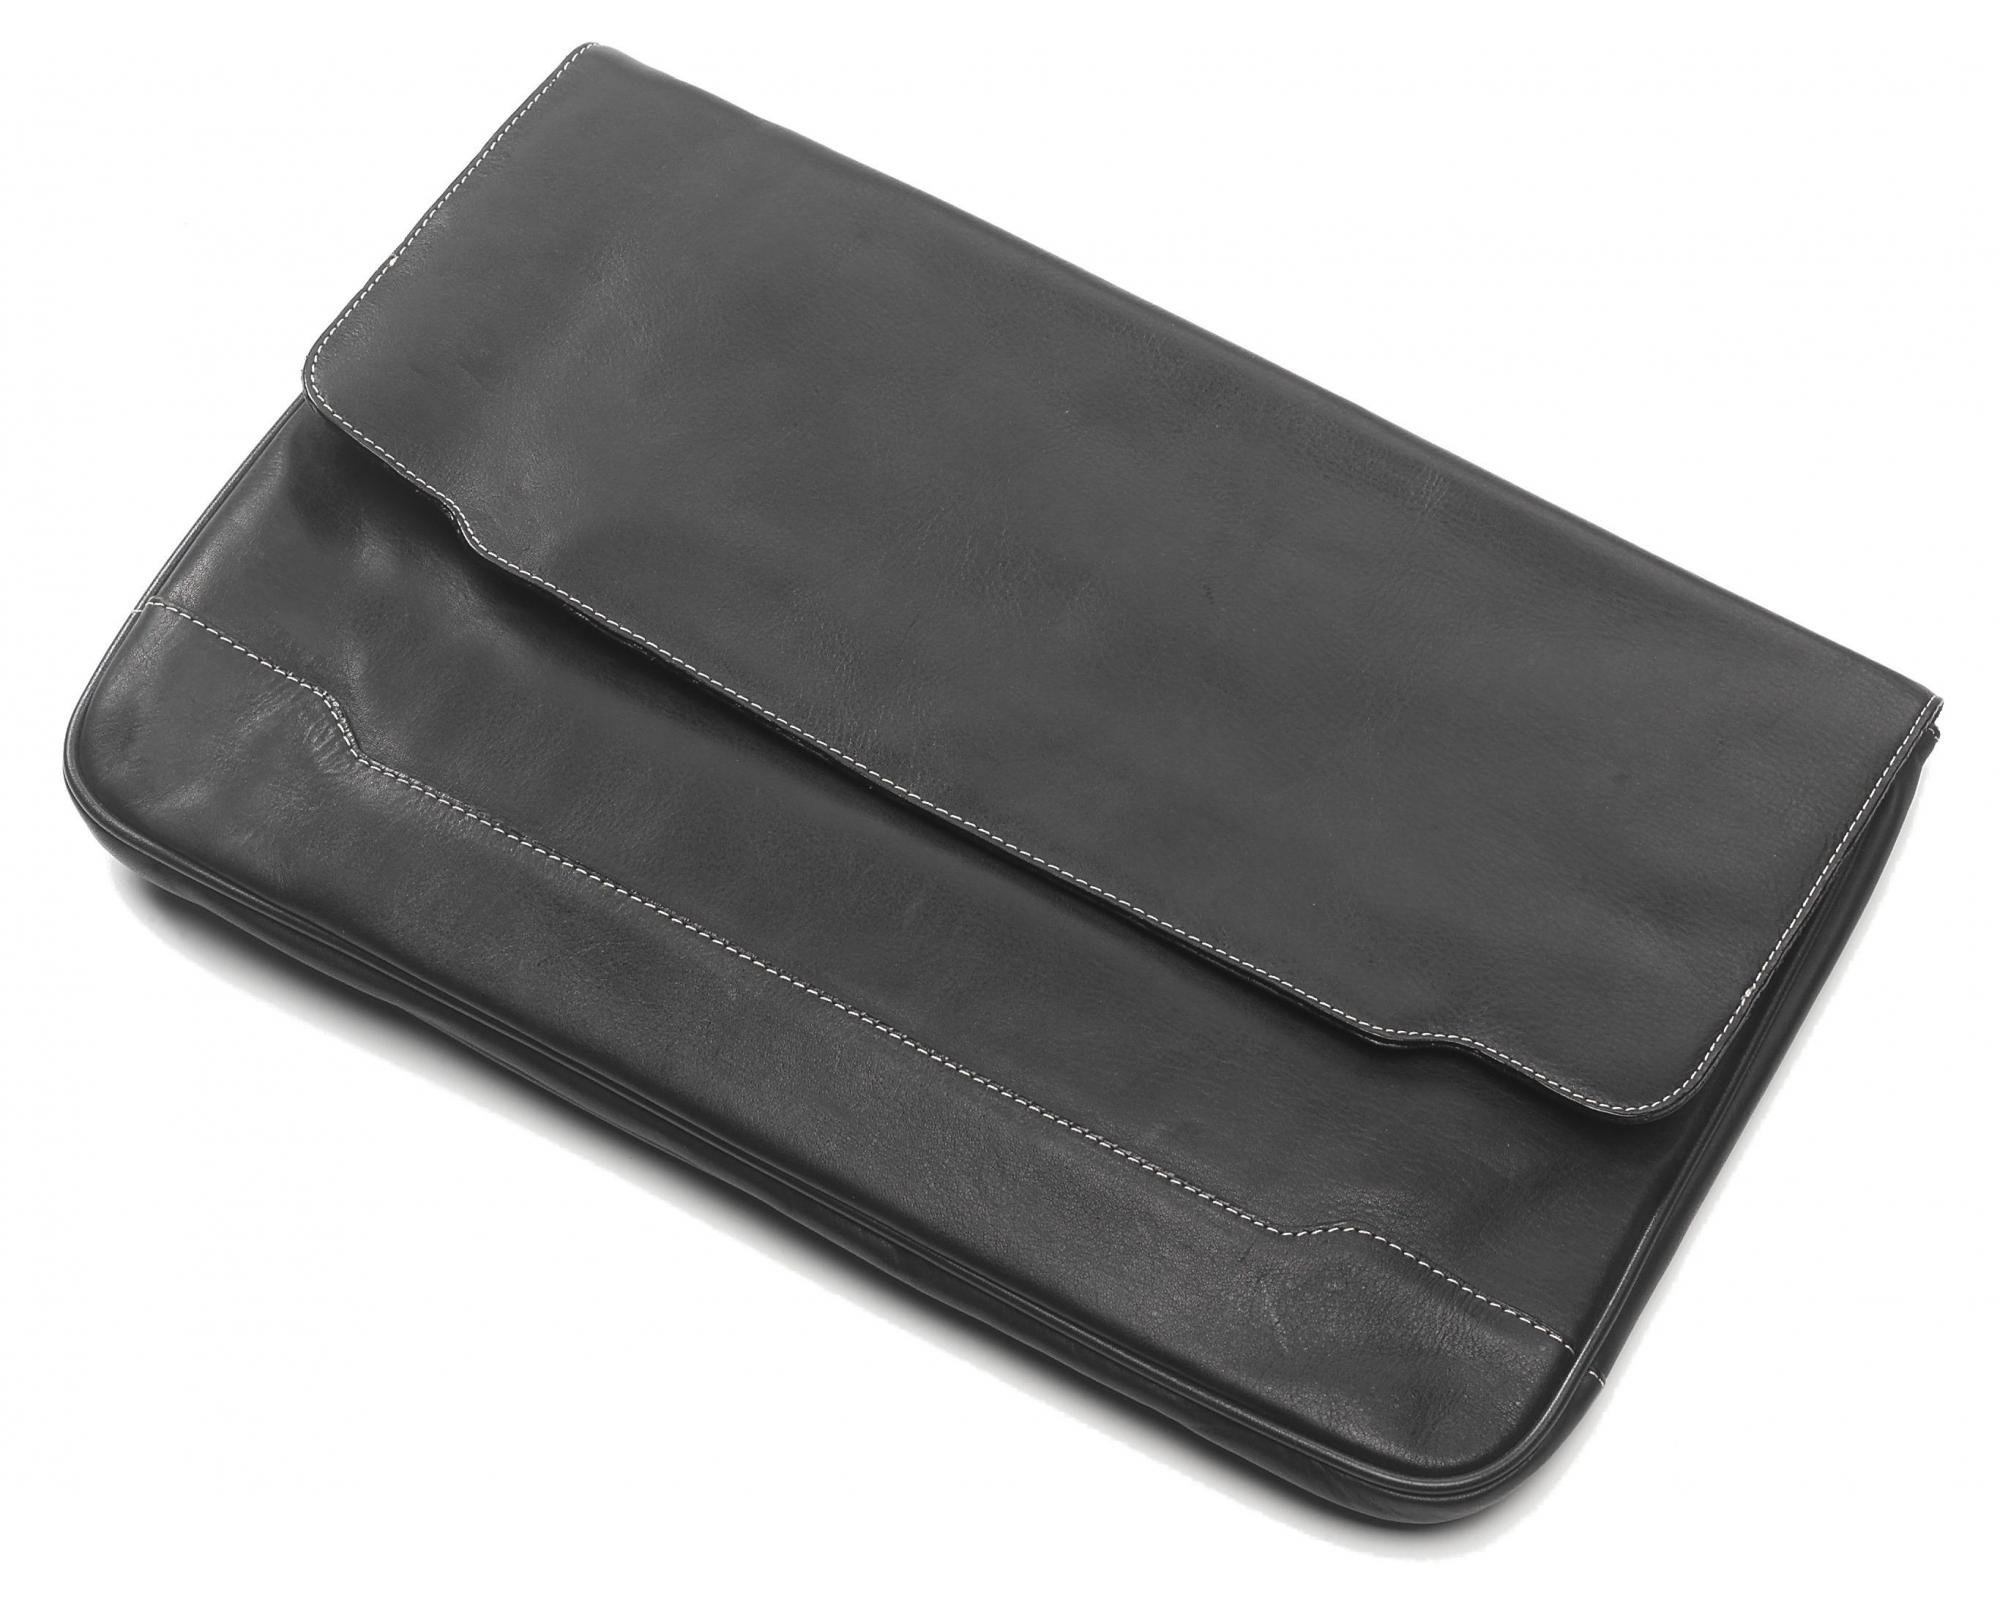 Clava Tuscan Leather Document Folio (Tuscan Black)